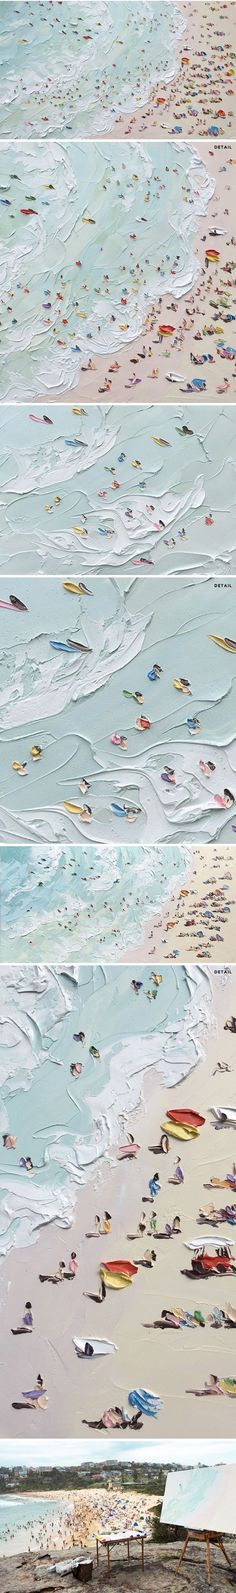 plein air paintings by sally west <3